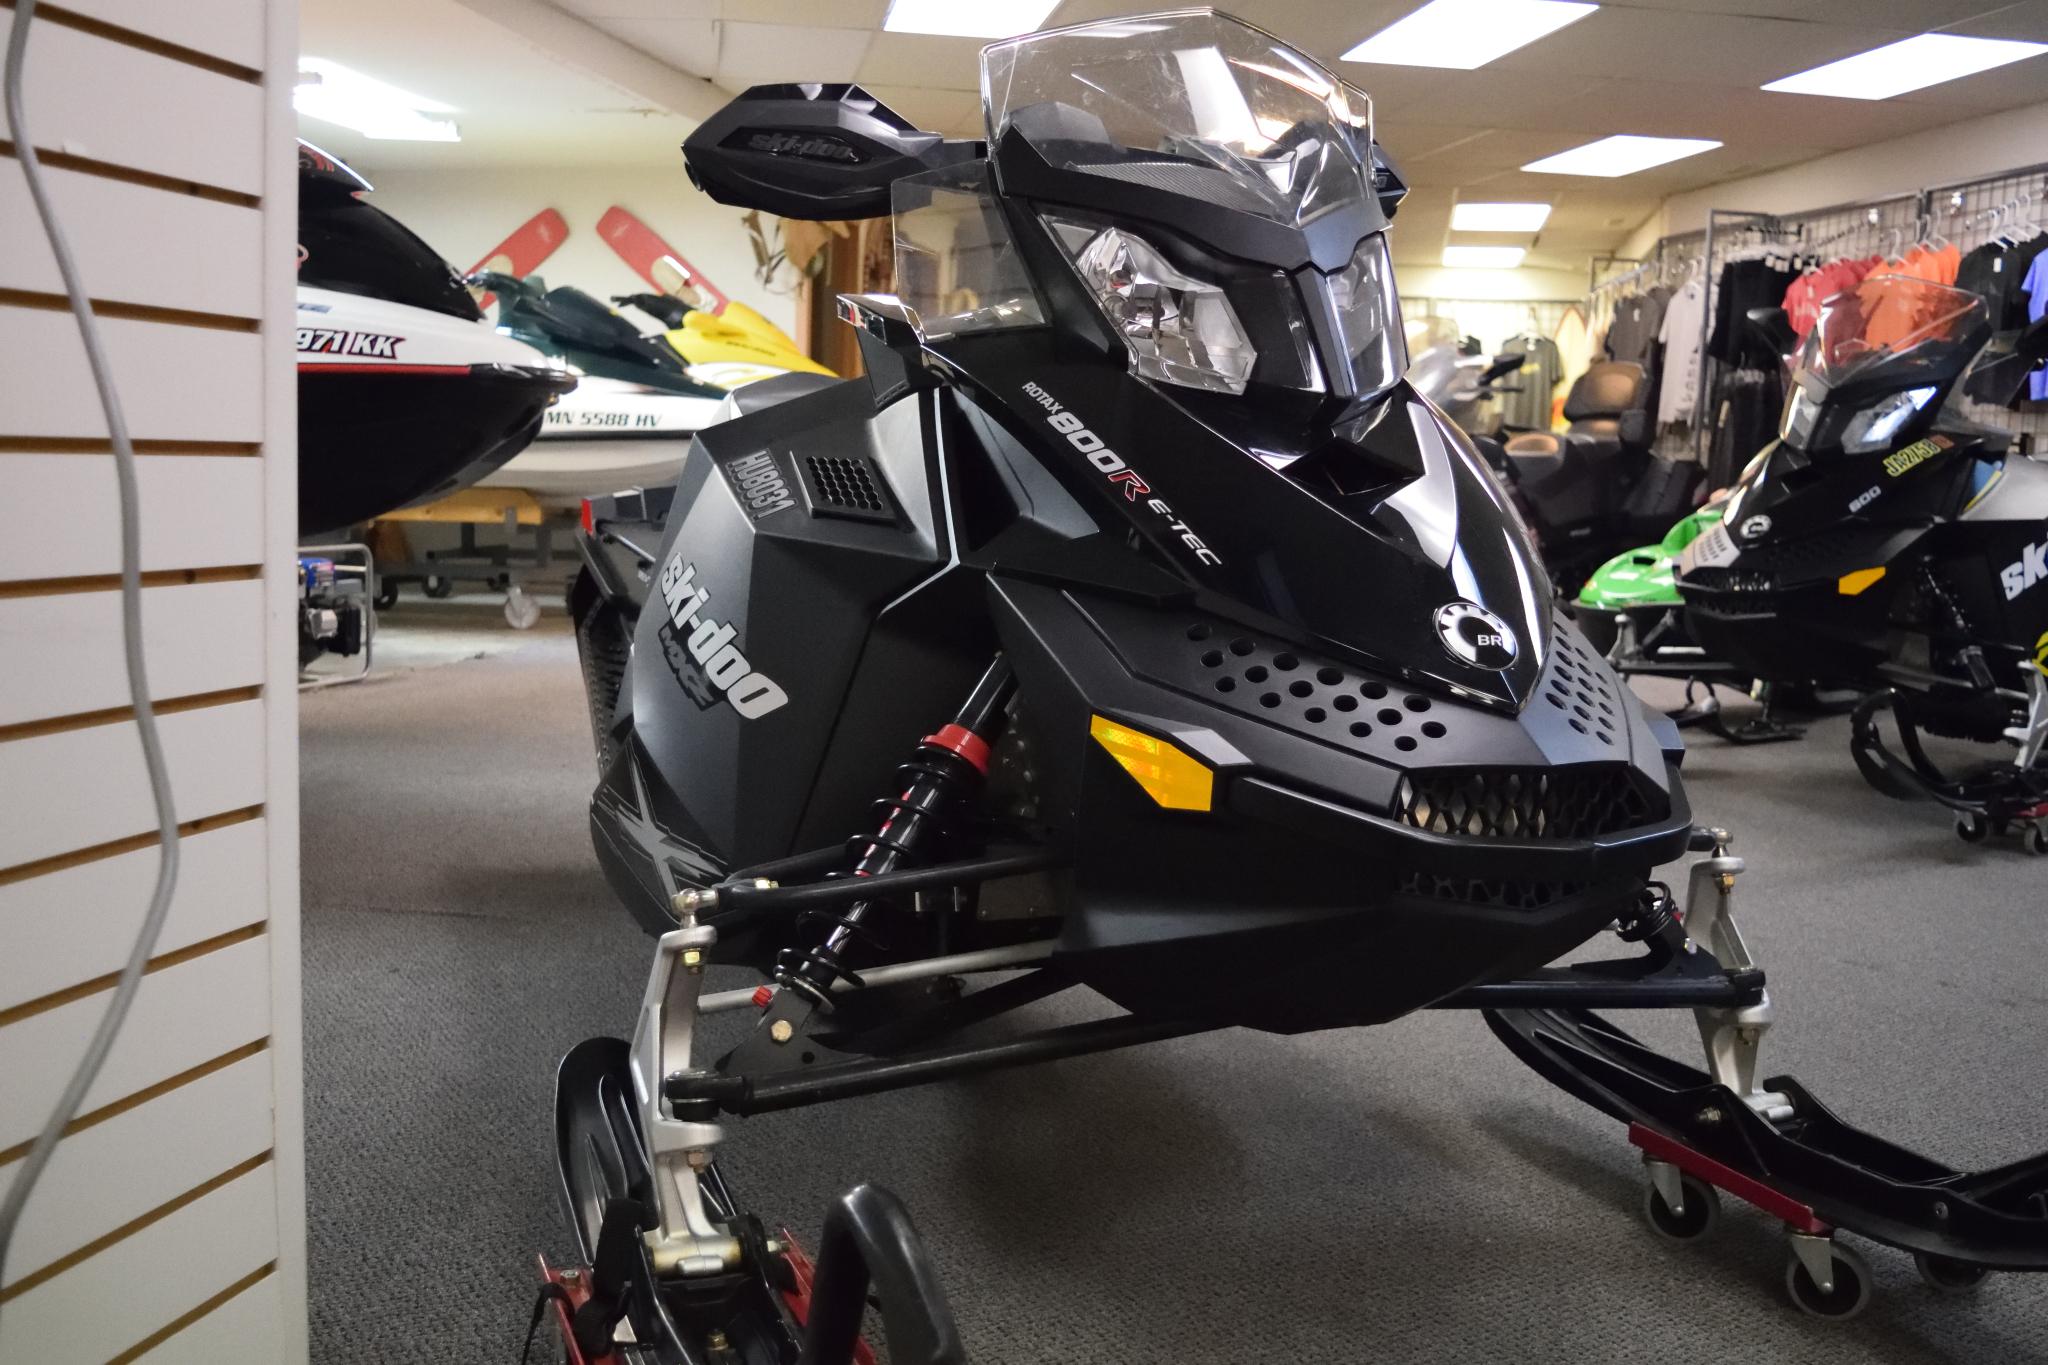 2011 Ski Doo MXZ X 800R E-TEC Seaberg Motorsports Crosslake MN